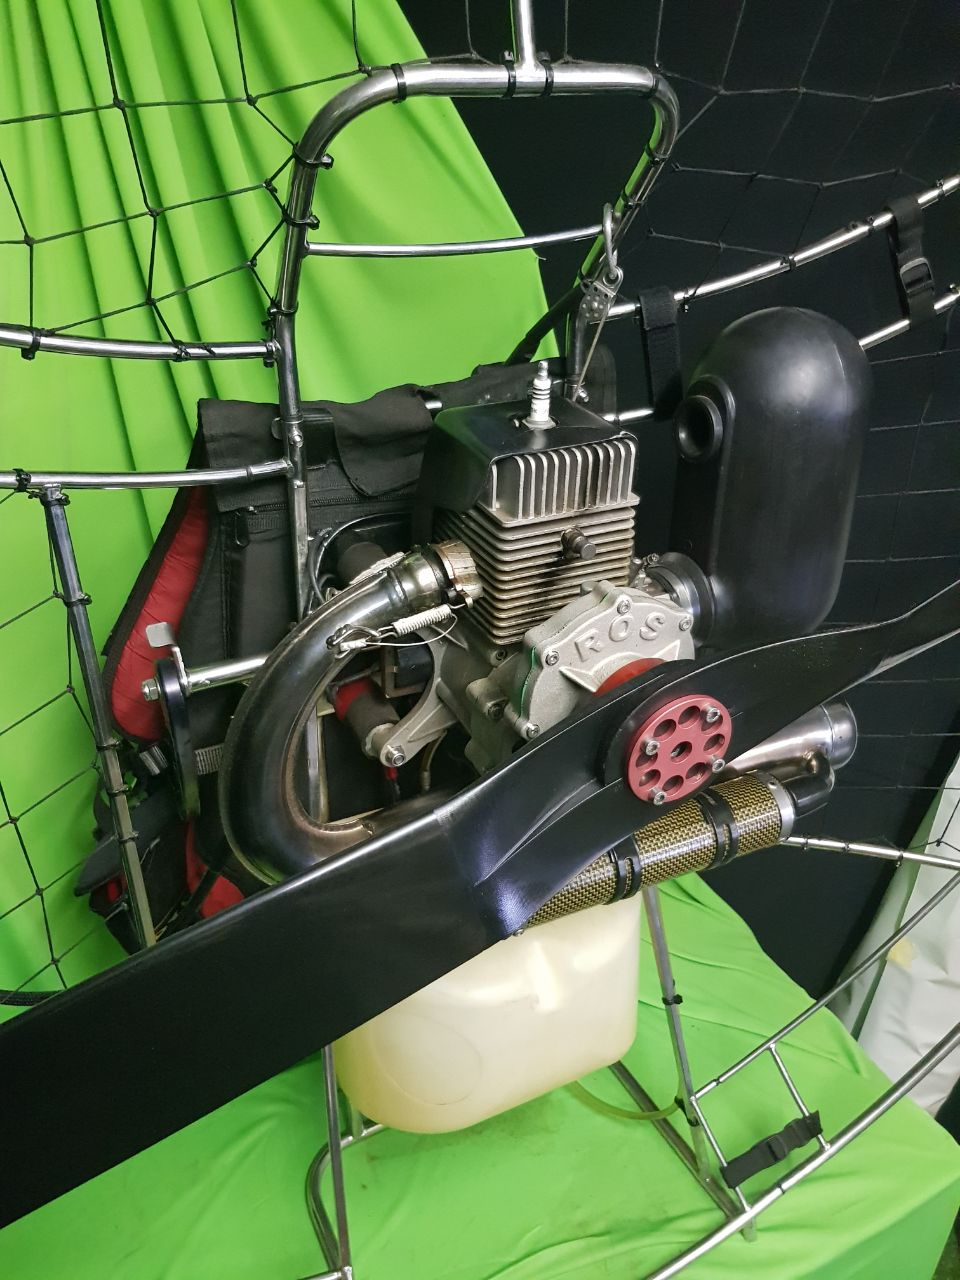 Paramotor PxP Ross 125 for sale